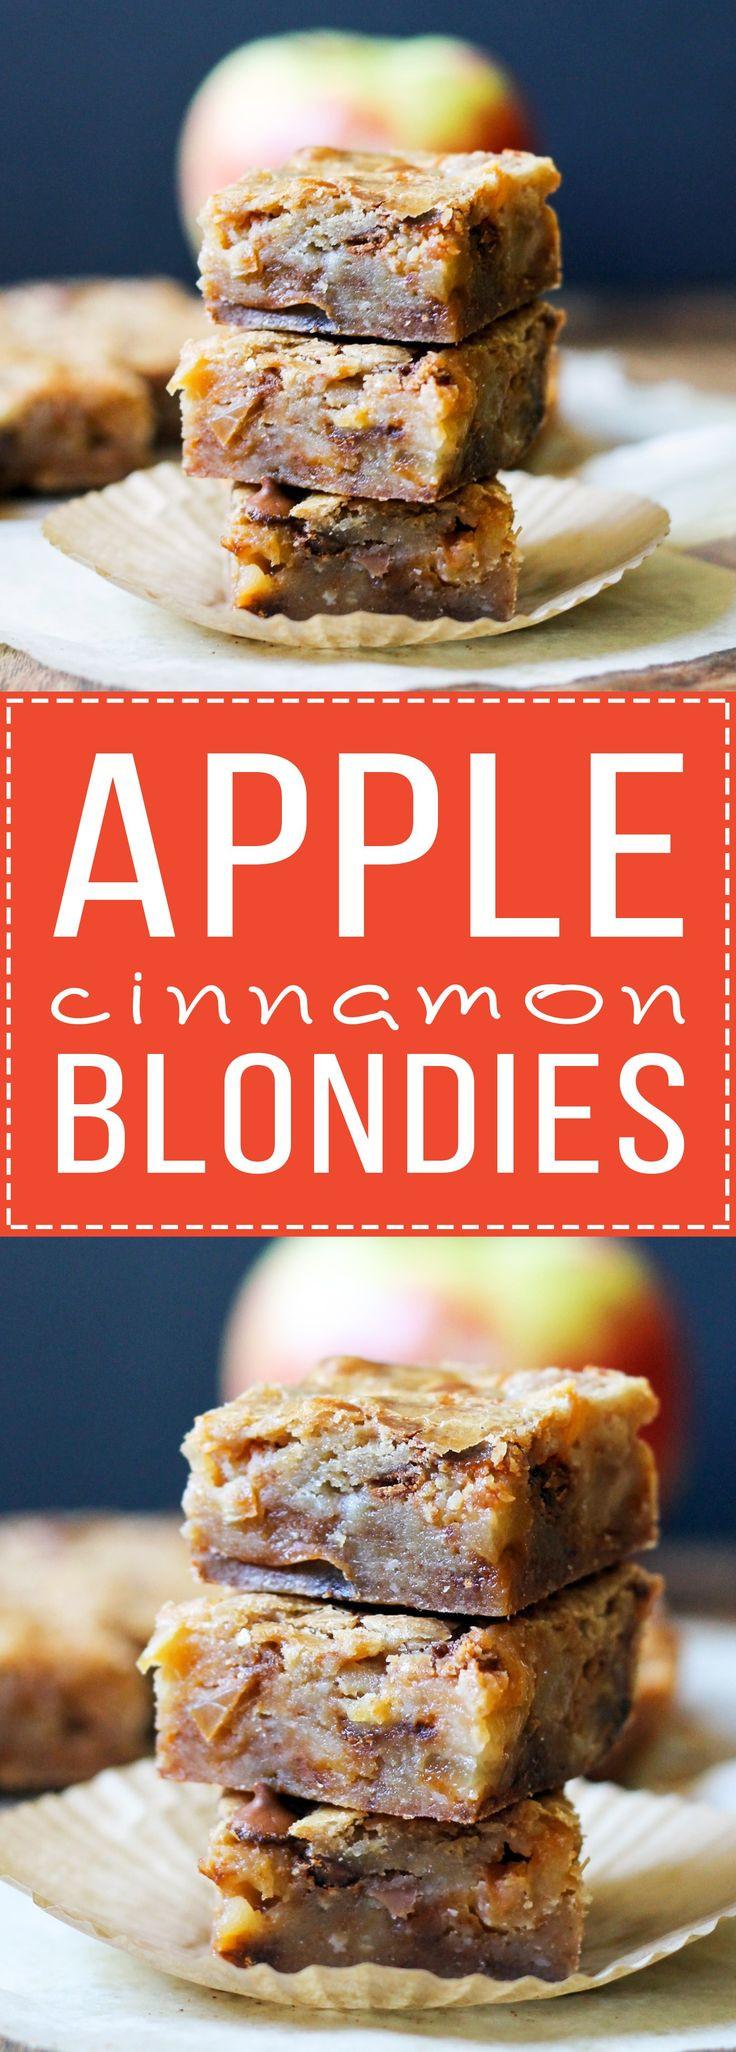 Fall Apple Desserts  Best 25 Apple desserts ideas on Pinterest